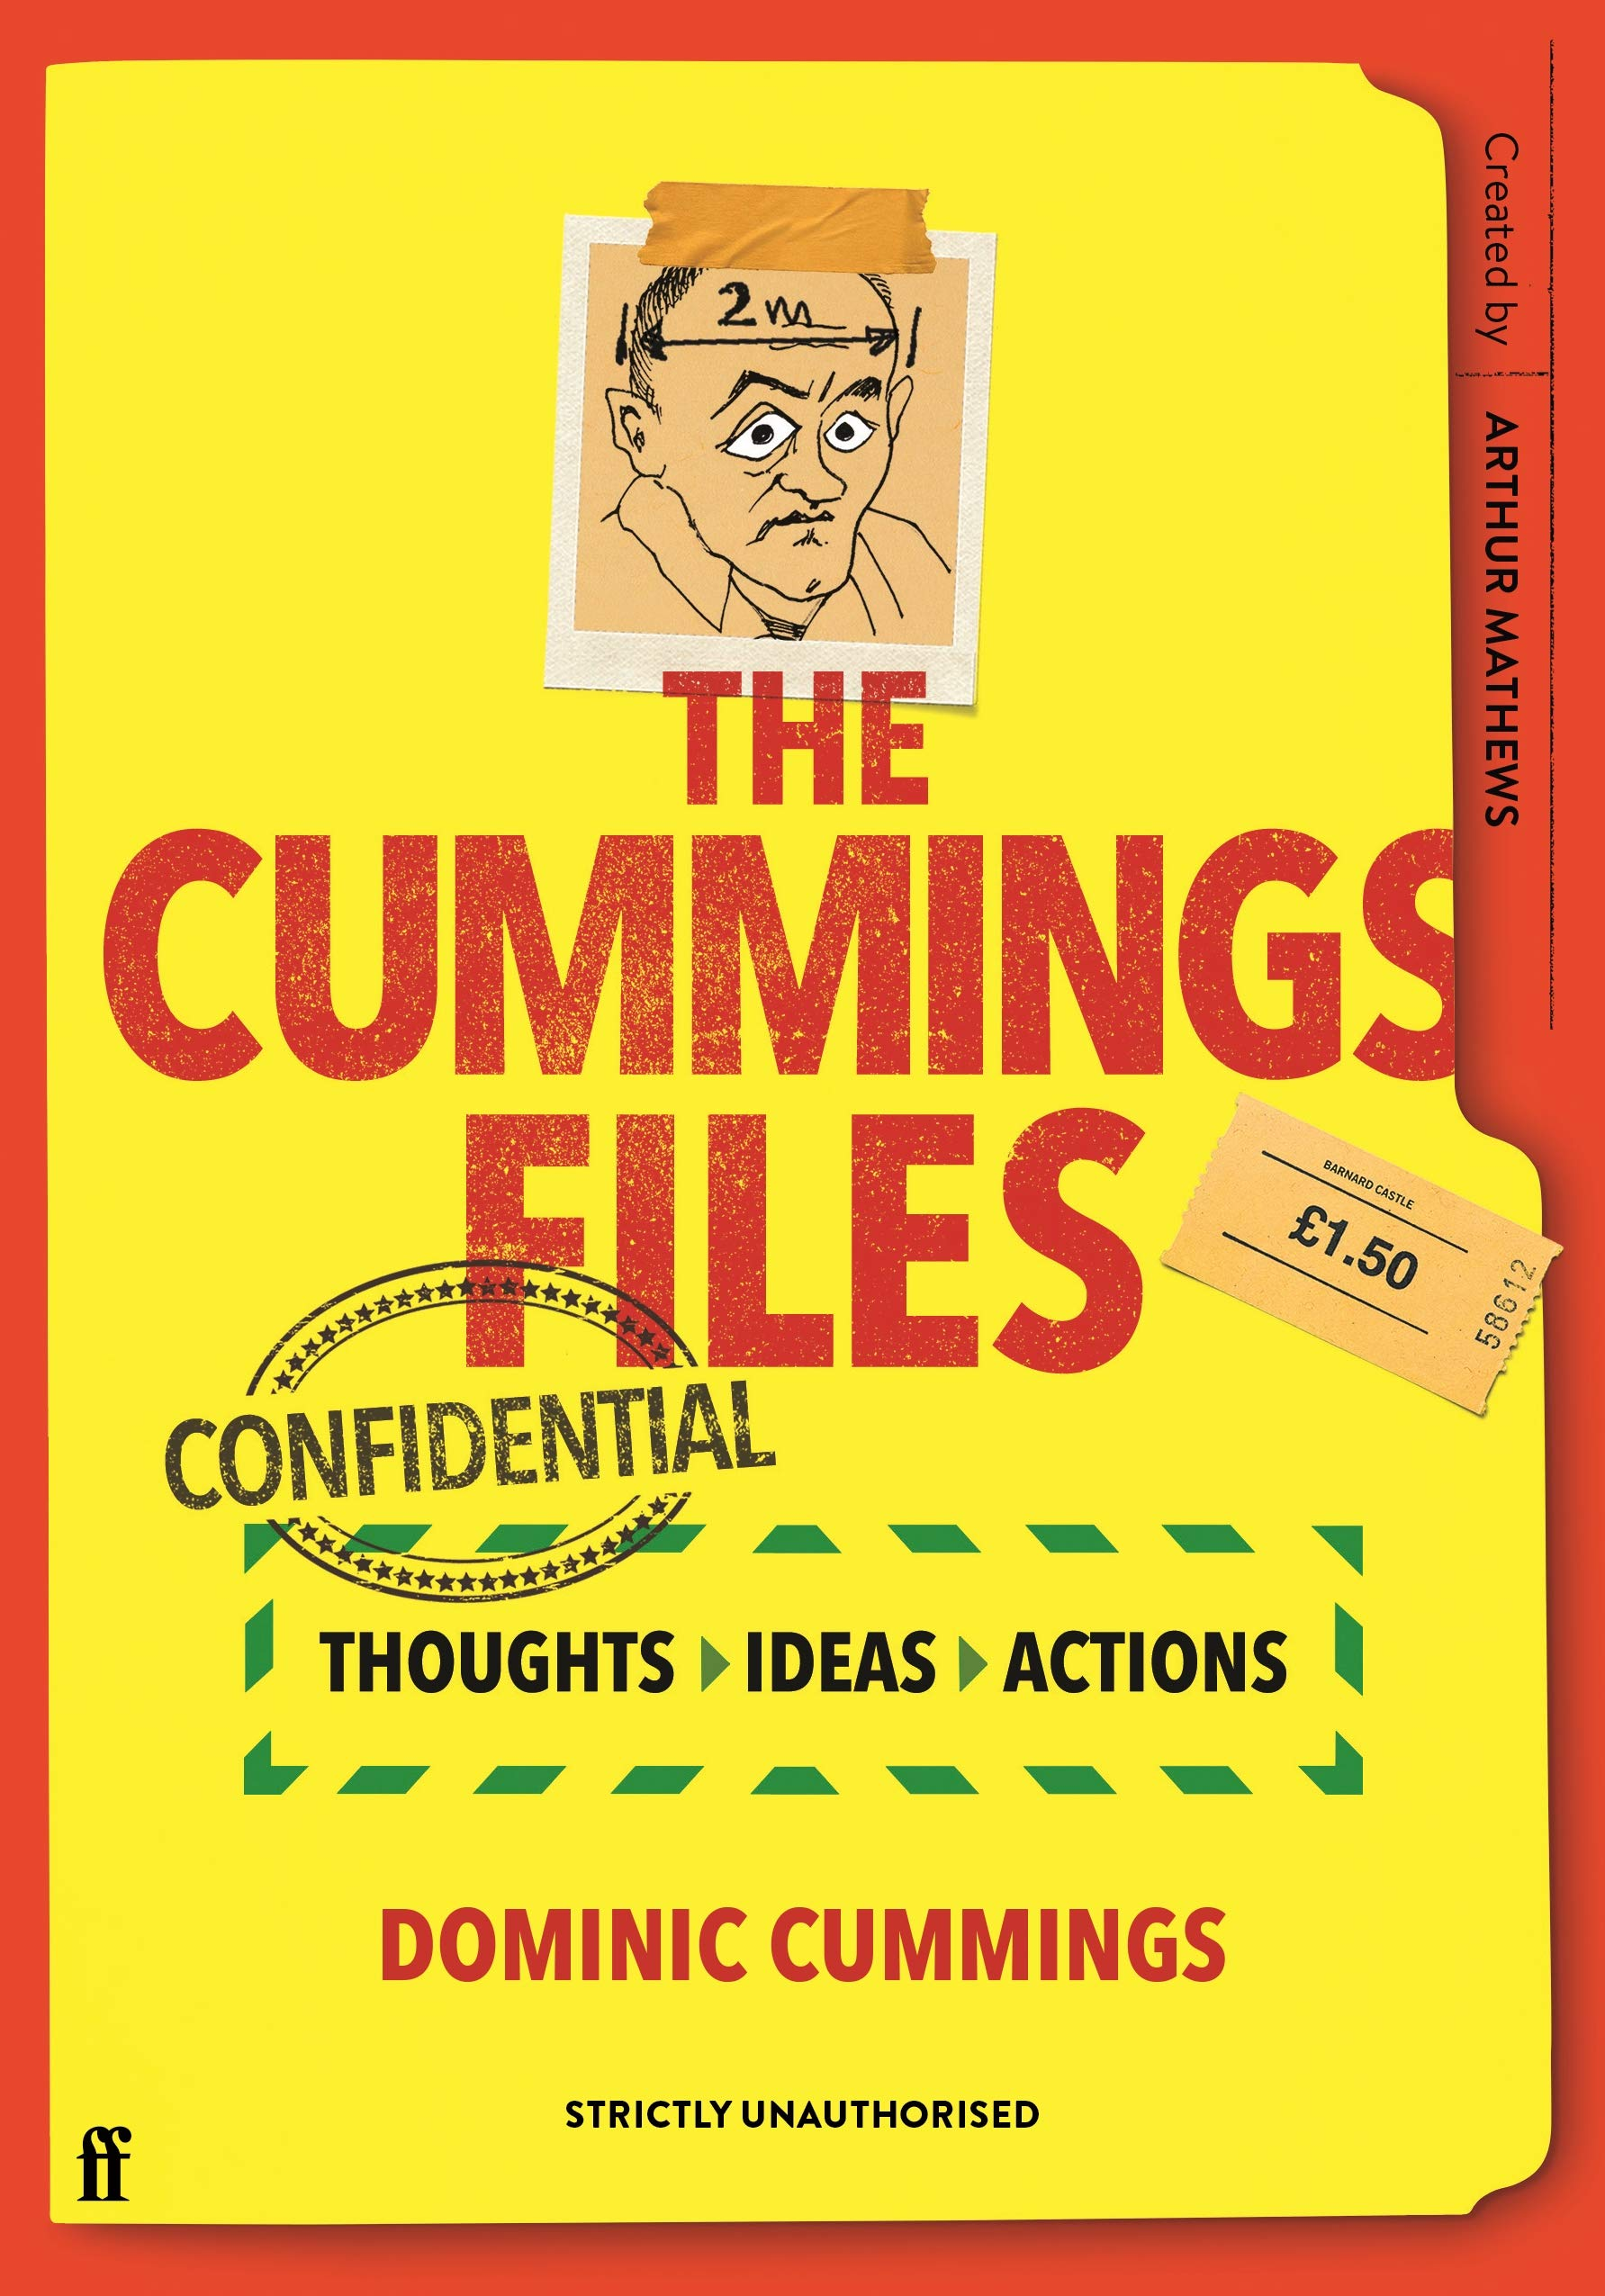 The Cummings Files